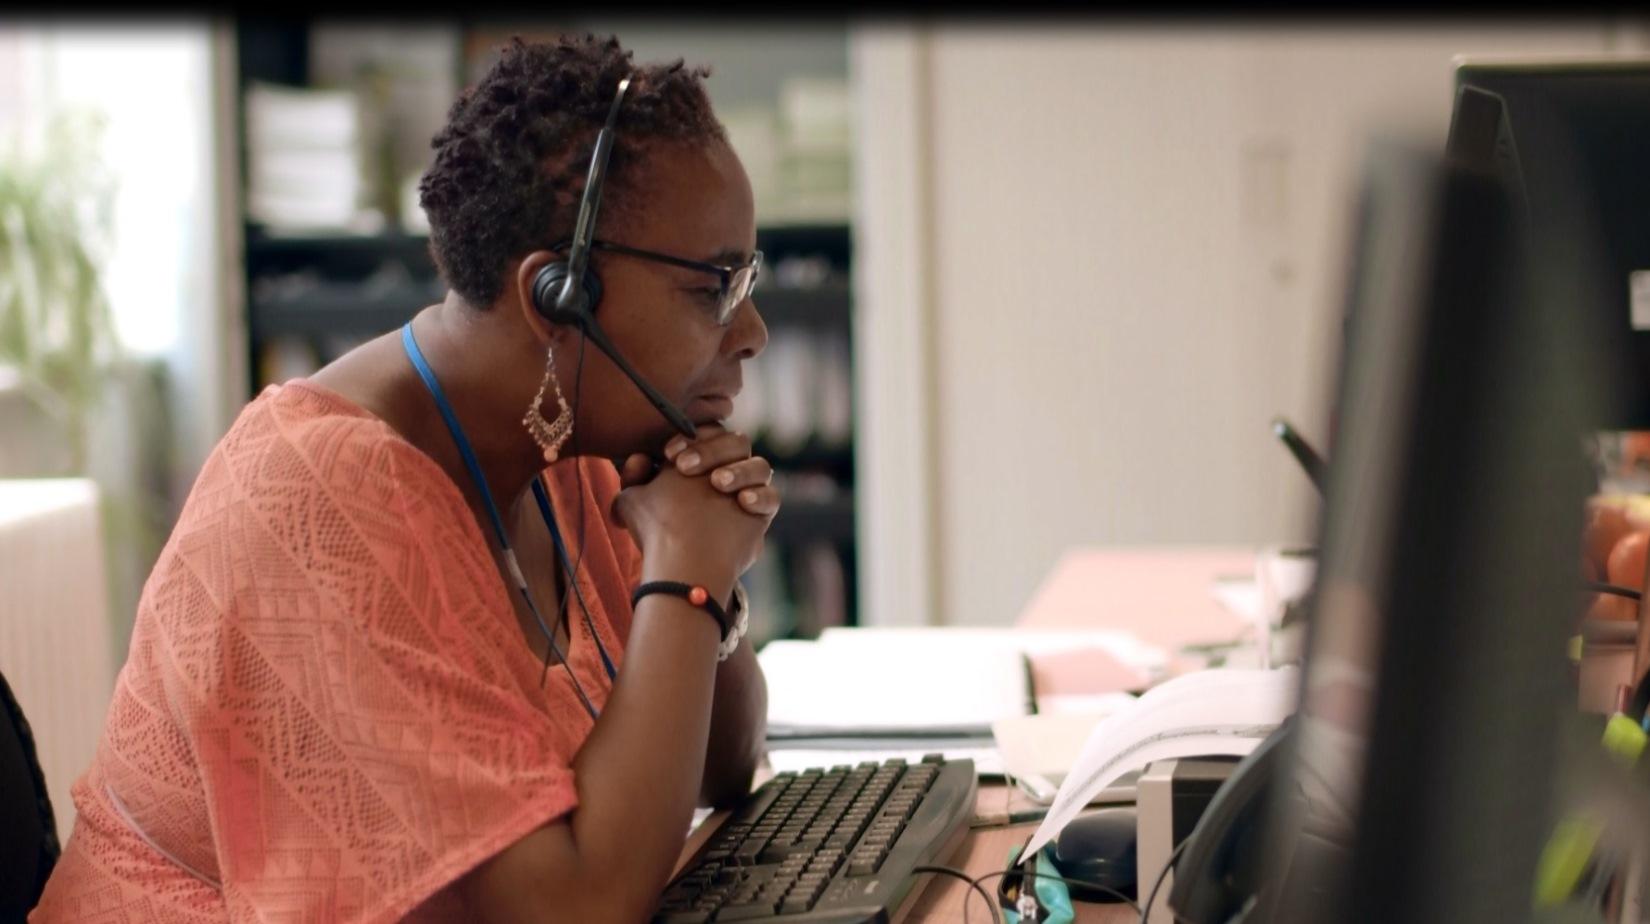 Marcia our helpline adviser on the phone